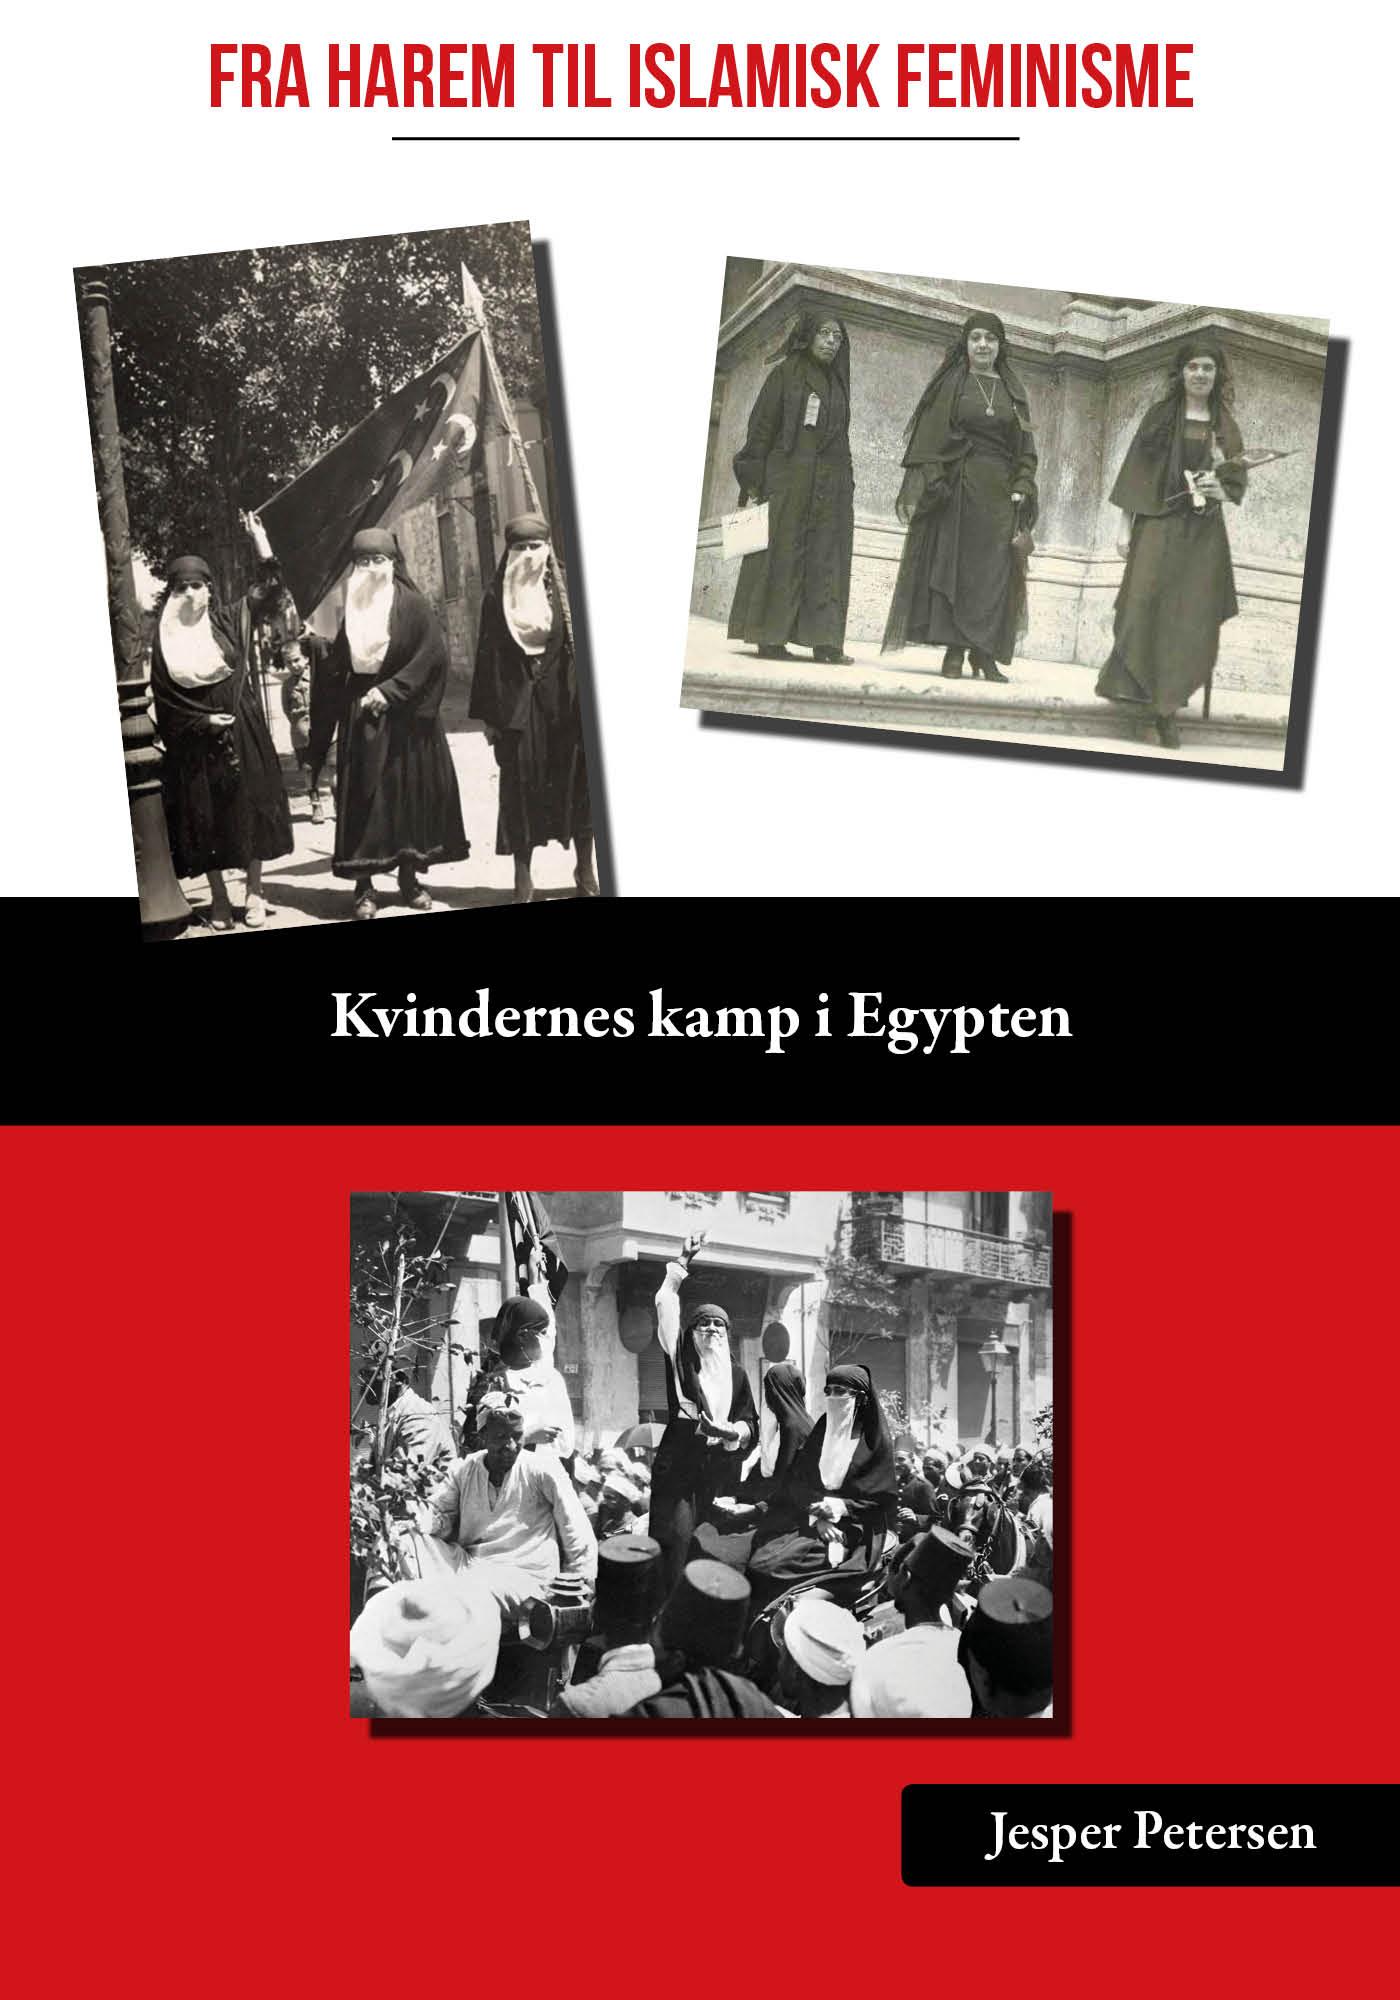 N/A Fra harem til islamisk feminisme - e-bog fra bog & mystik